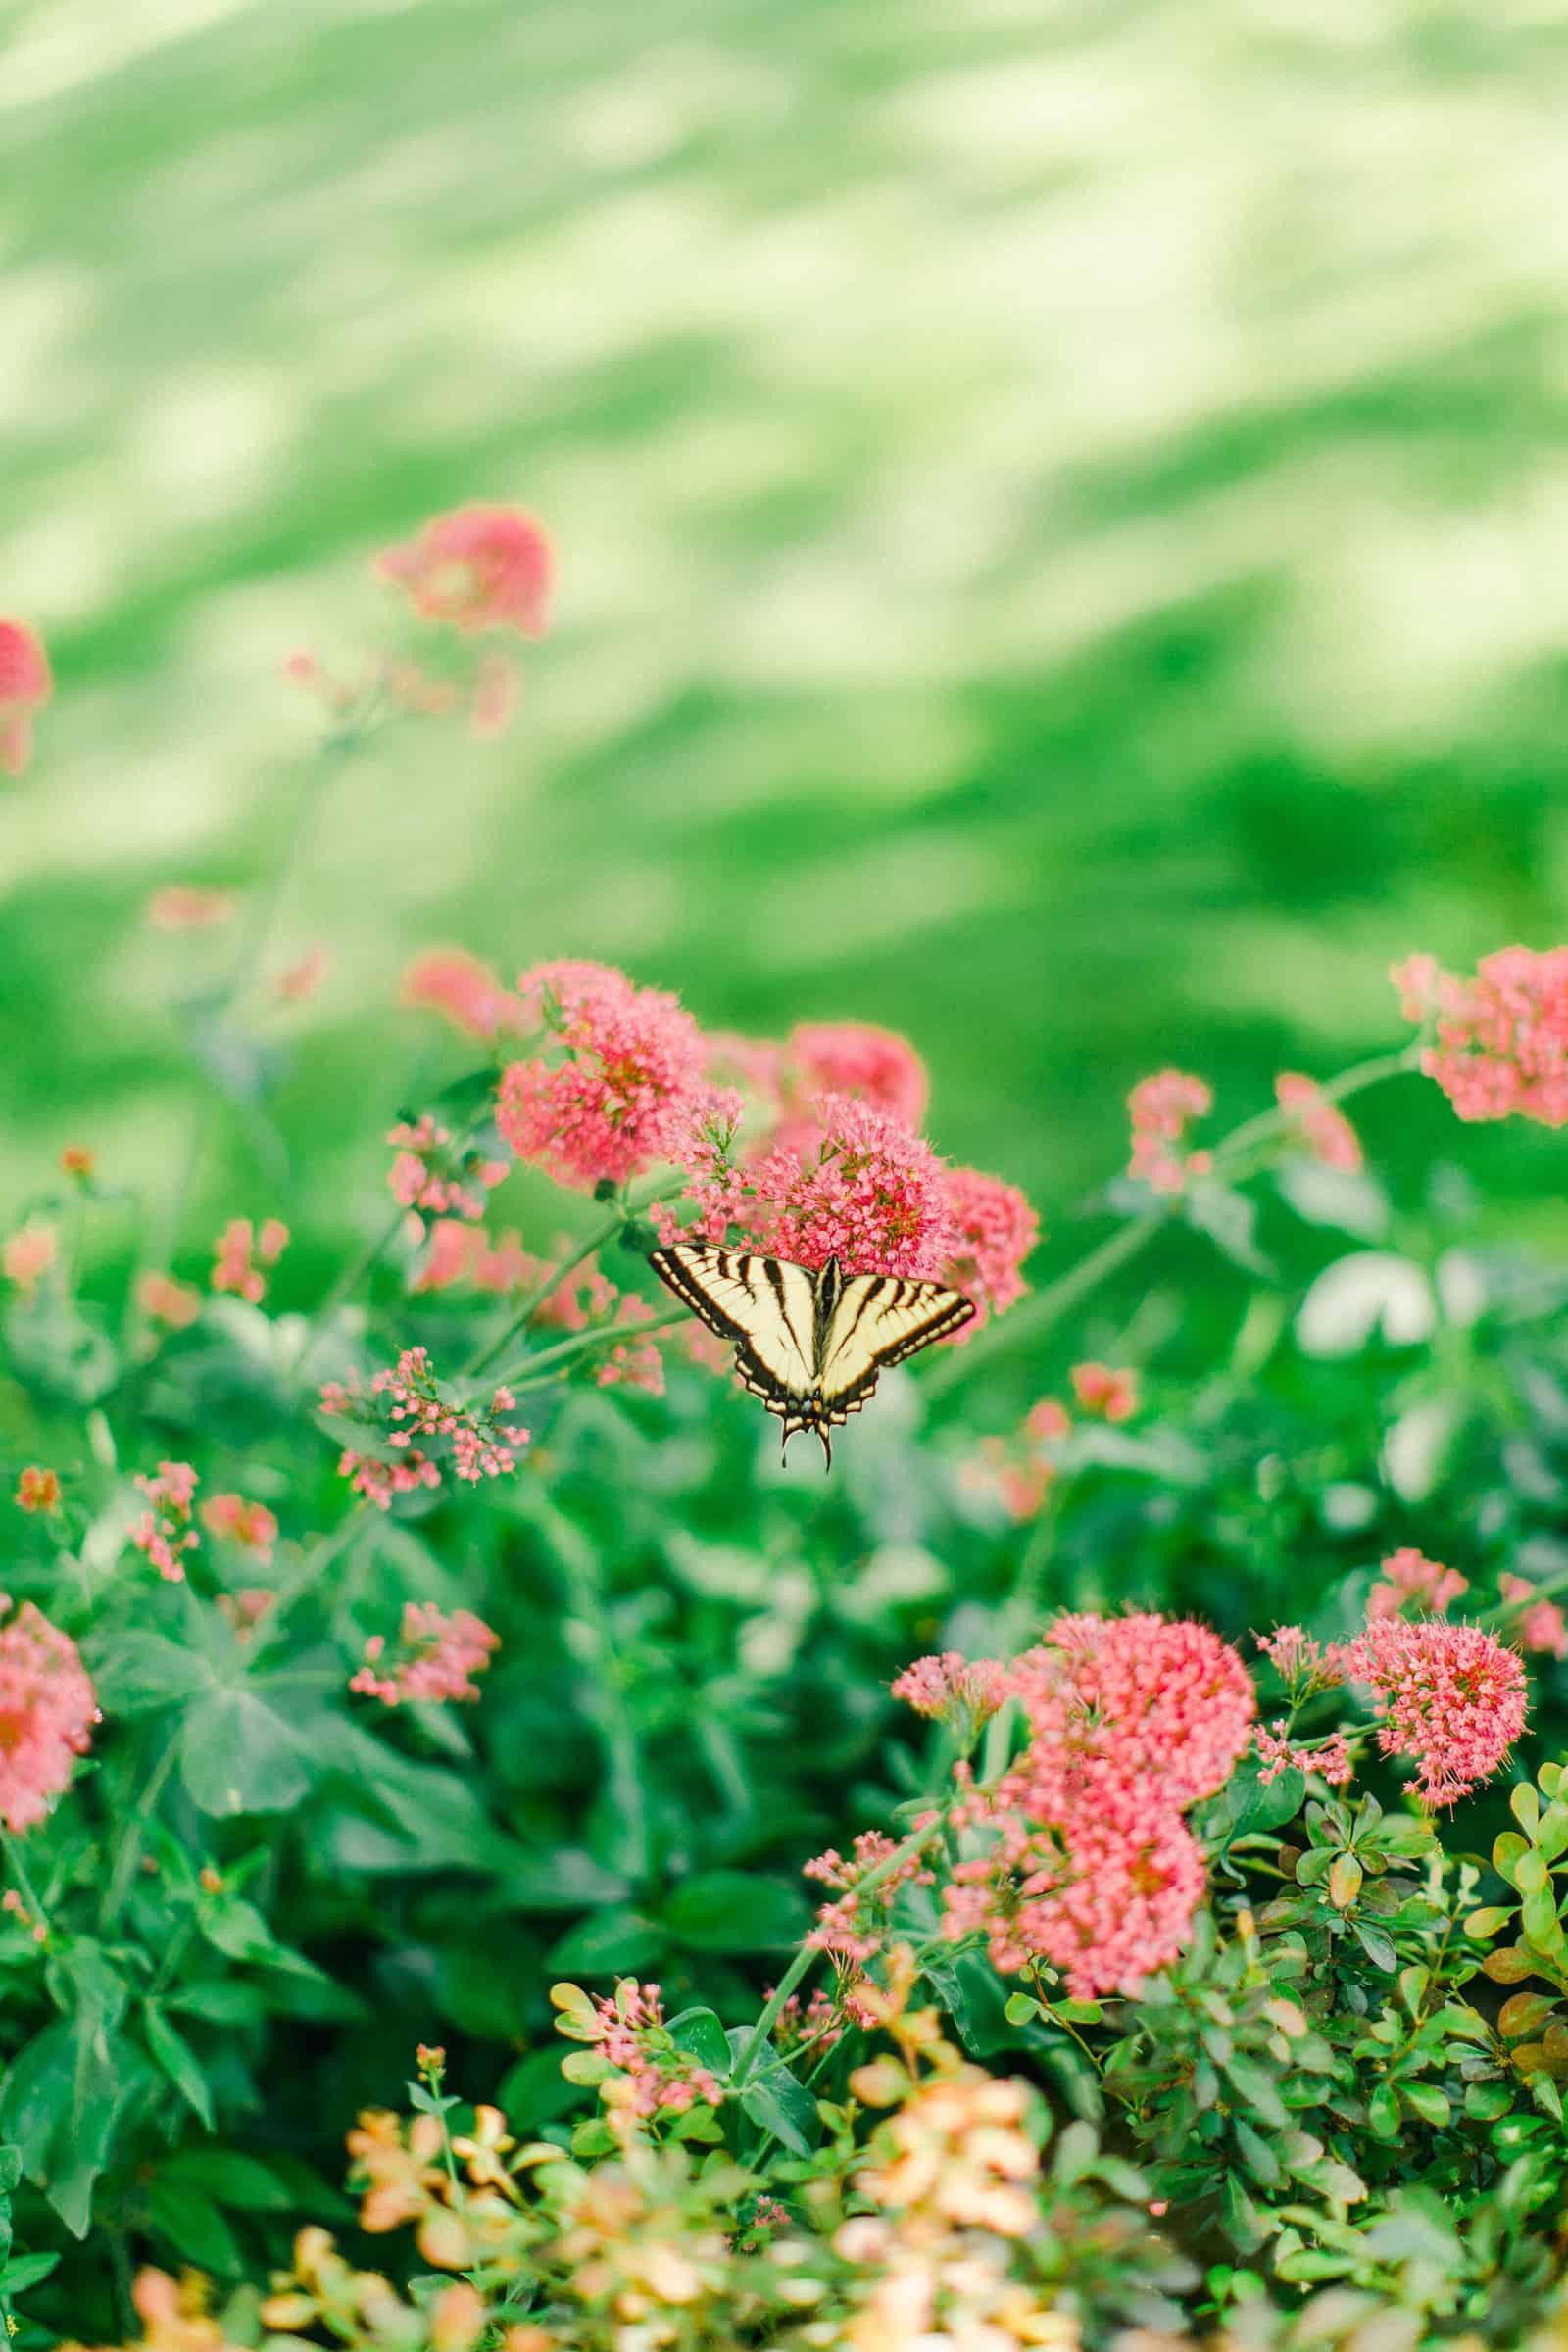 Draper LDS Temple Wedding, Utah wedding photography, summer backyard wedding, butterfly in flowers, nature photography